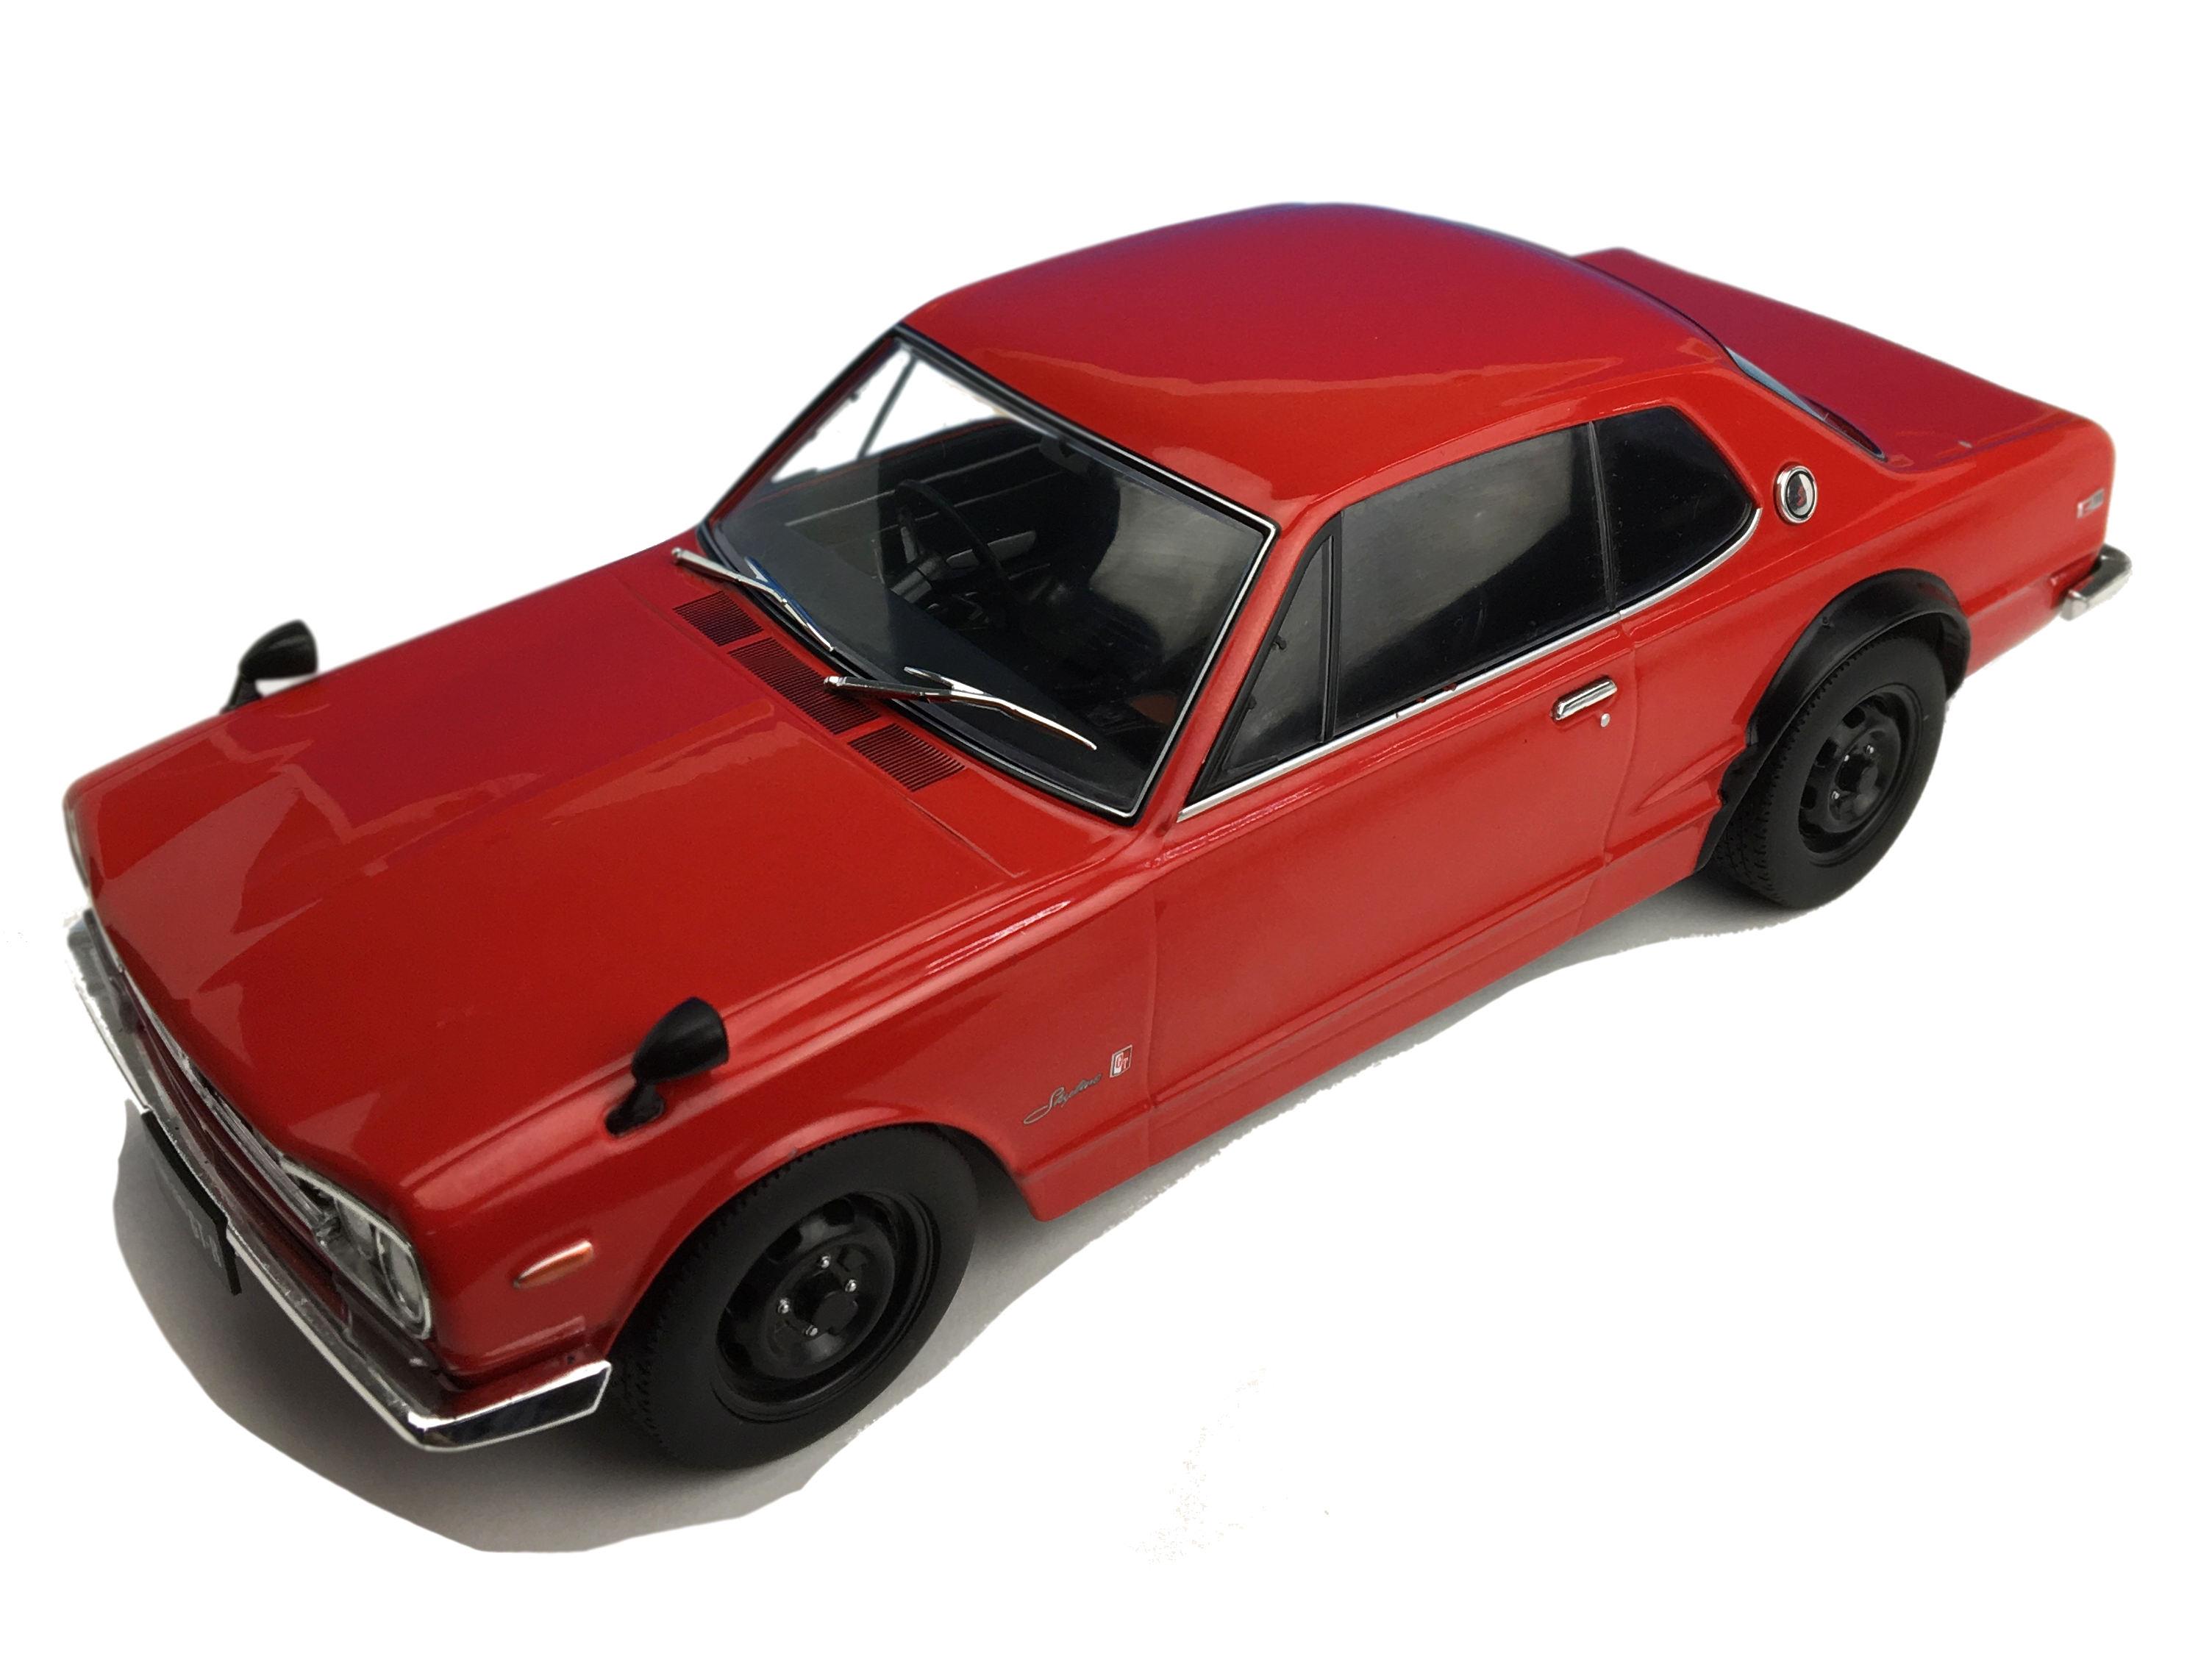 First18/ファースト18 日産 スカイライン GT-R (KPGC10) レッド